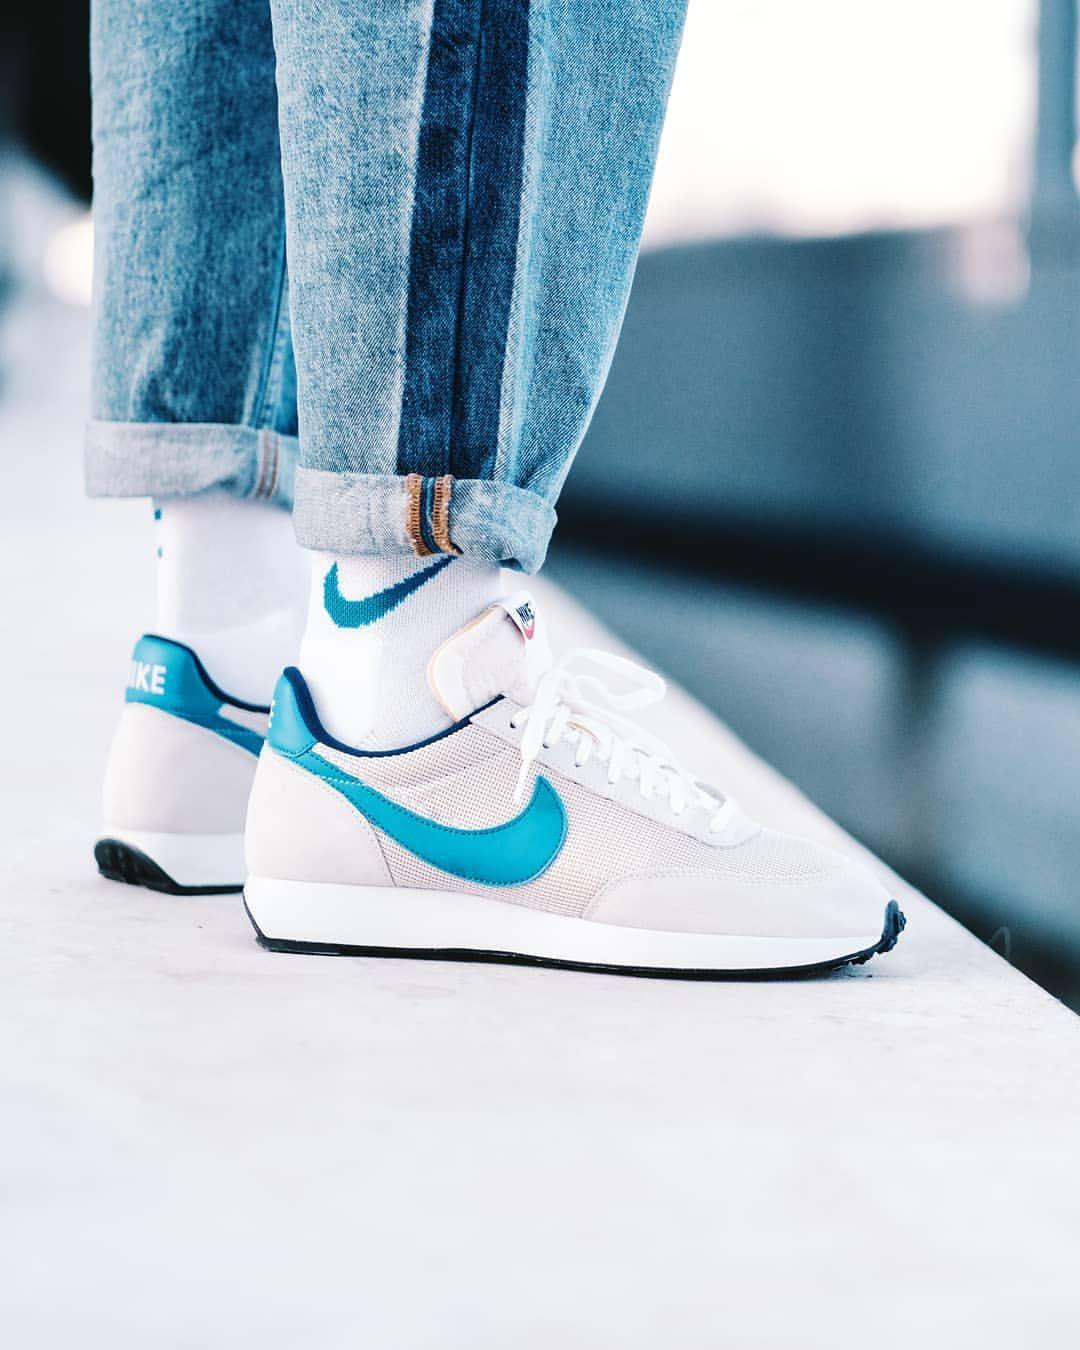 5e88cdfb41a3 Nike Air Tailwind 79